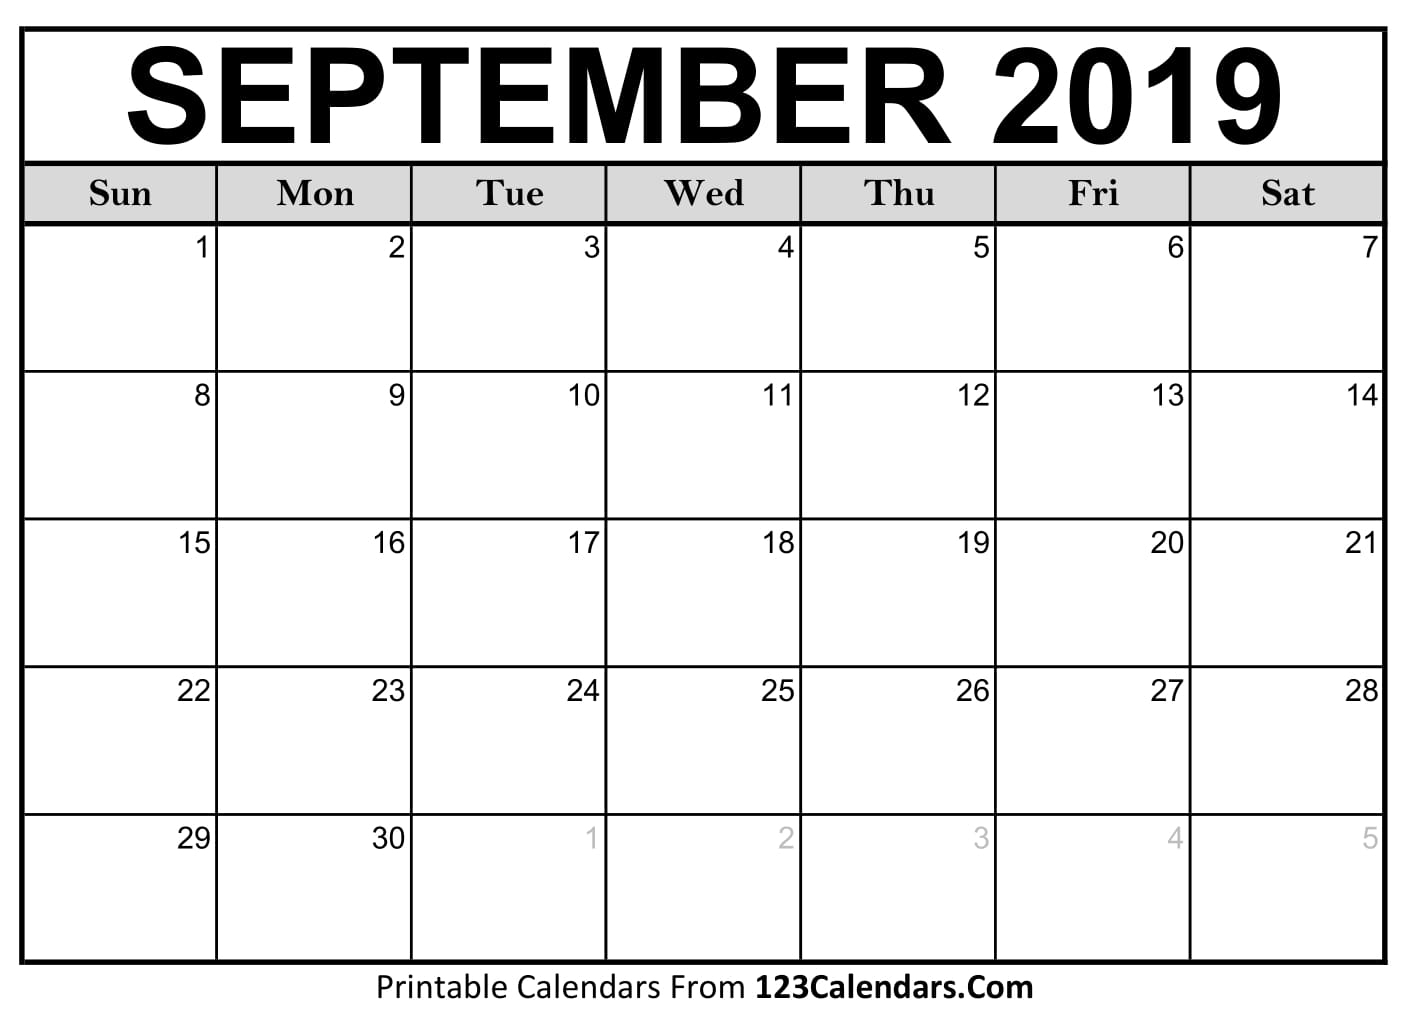 September 2019 Printable Calendar | 123Calendars with Printable Calendar 2019 2020 Write On